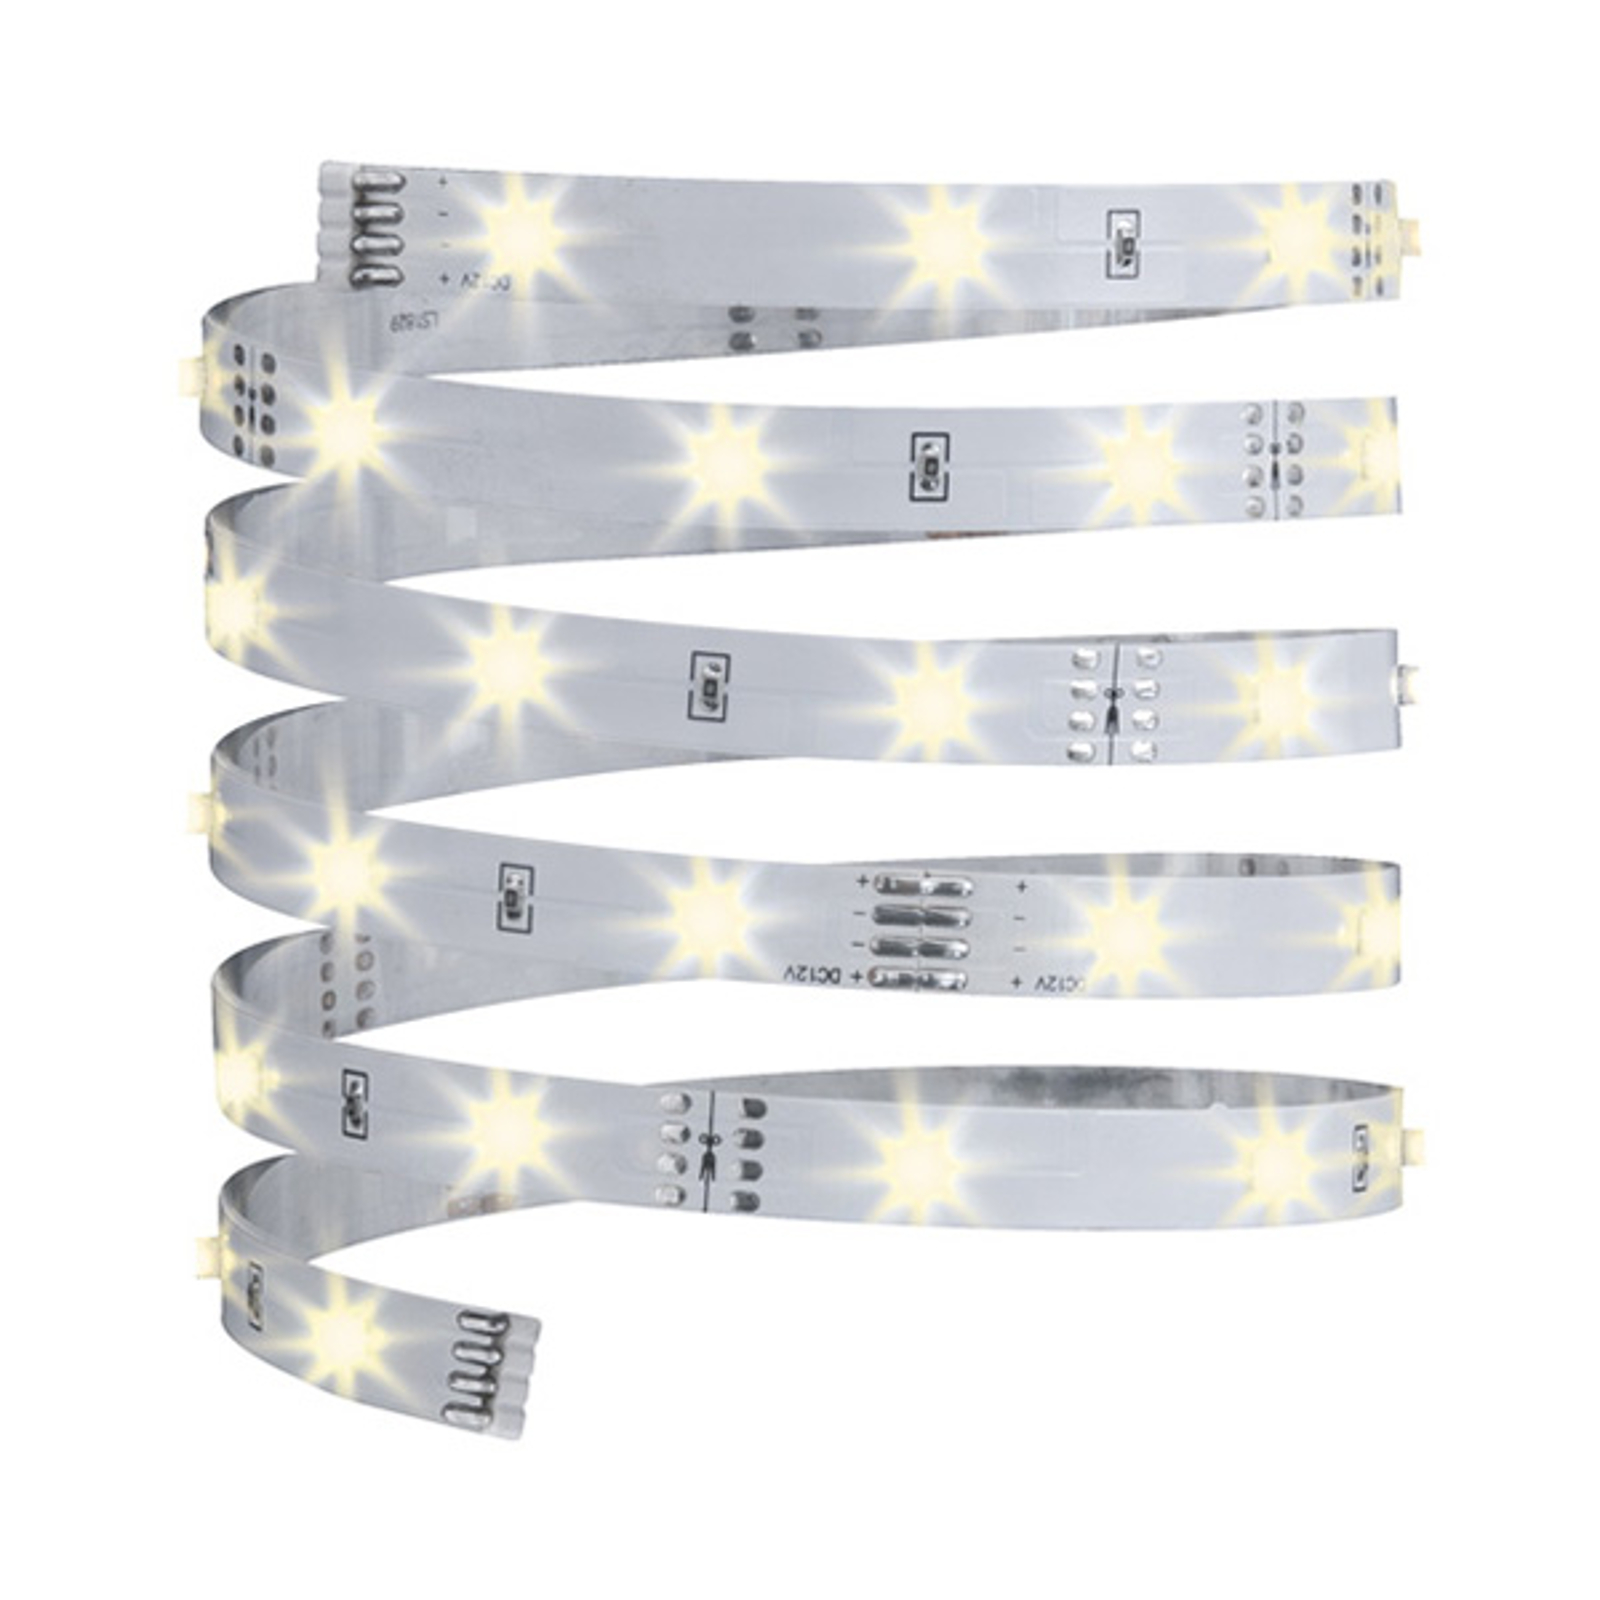 3 m lange LED strip YourLED Eco, wit, warm wit